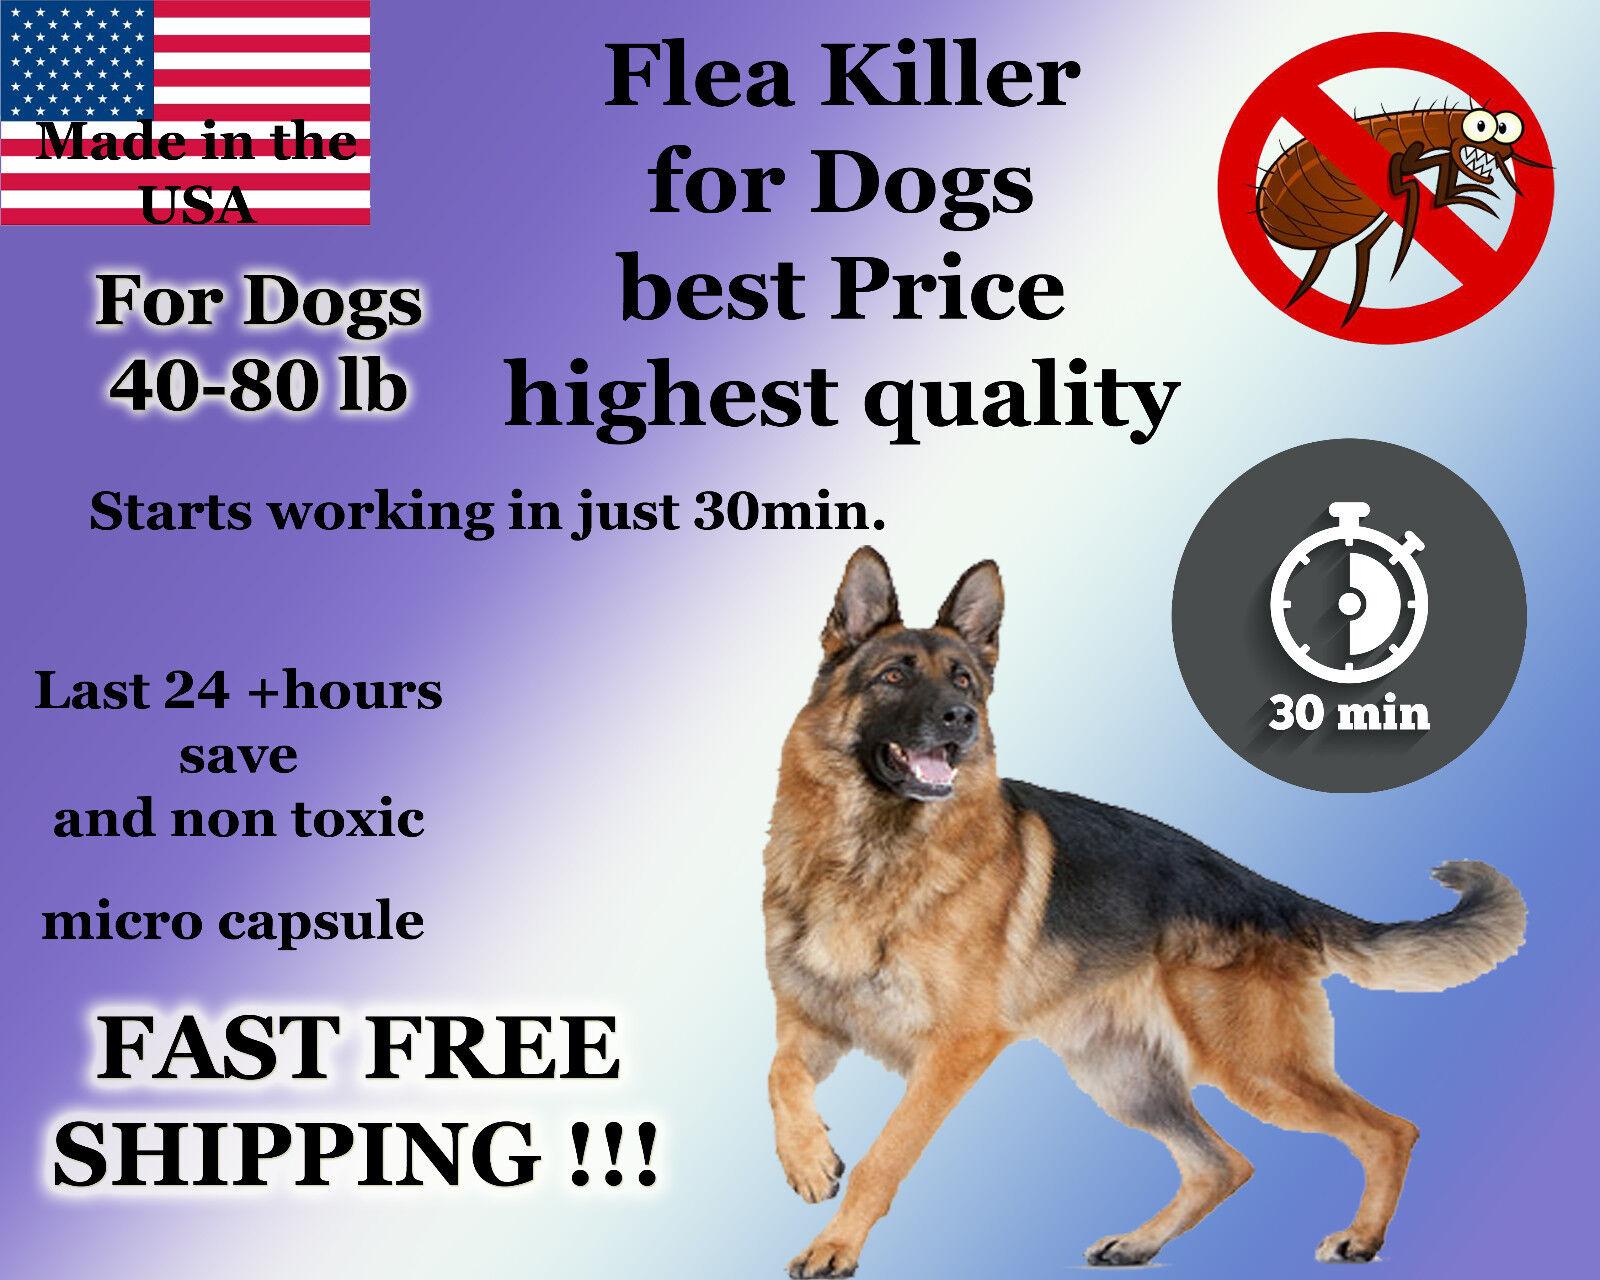 100 Capsules Instant Flea Killer Control Large Dogs 40-80lb +Soap Shampoo Sample